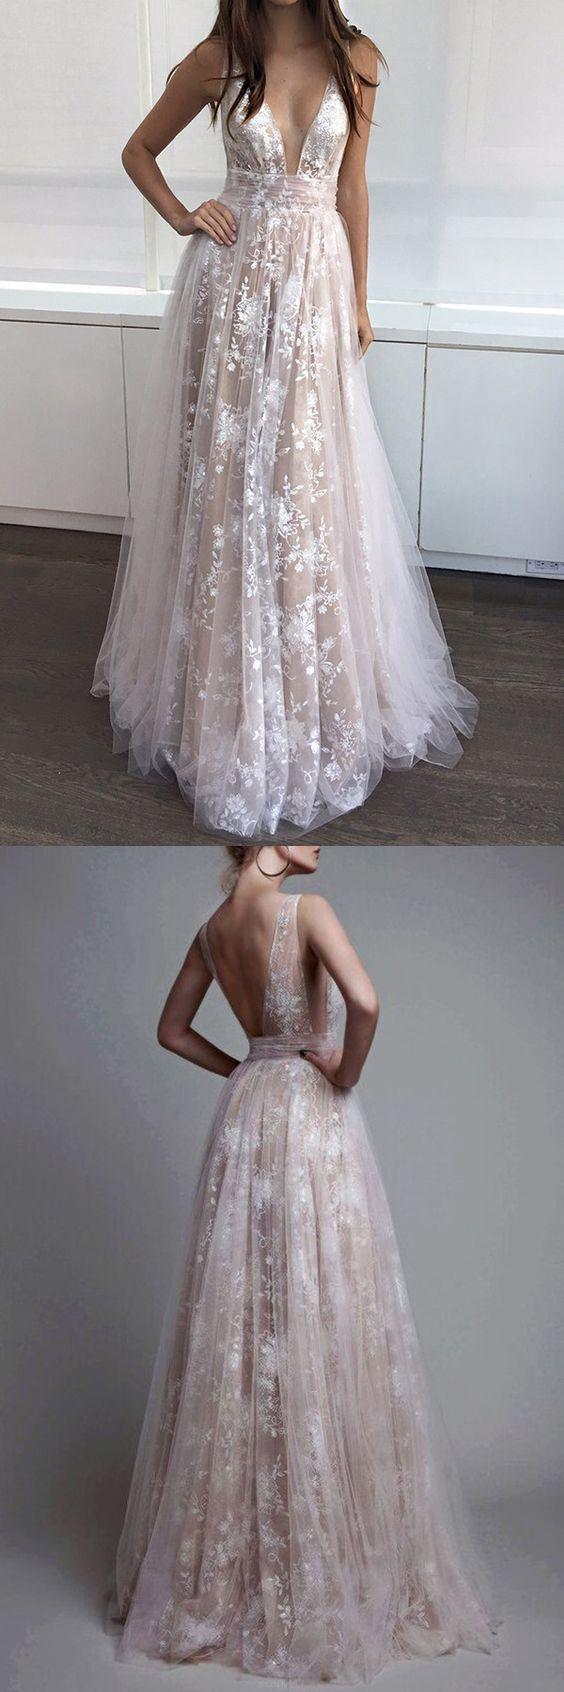 Customized sleeveless dresses long champagne evening prom dresses